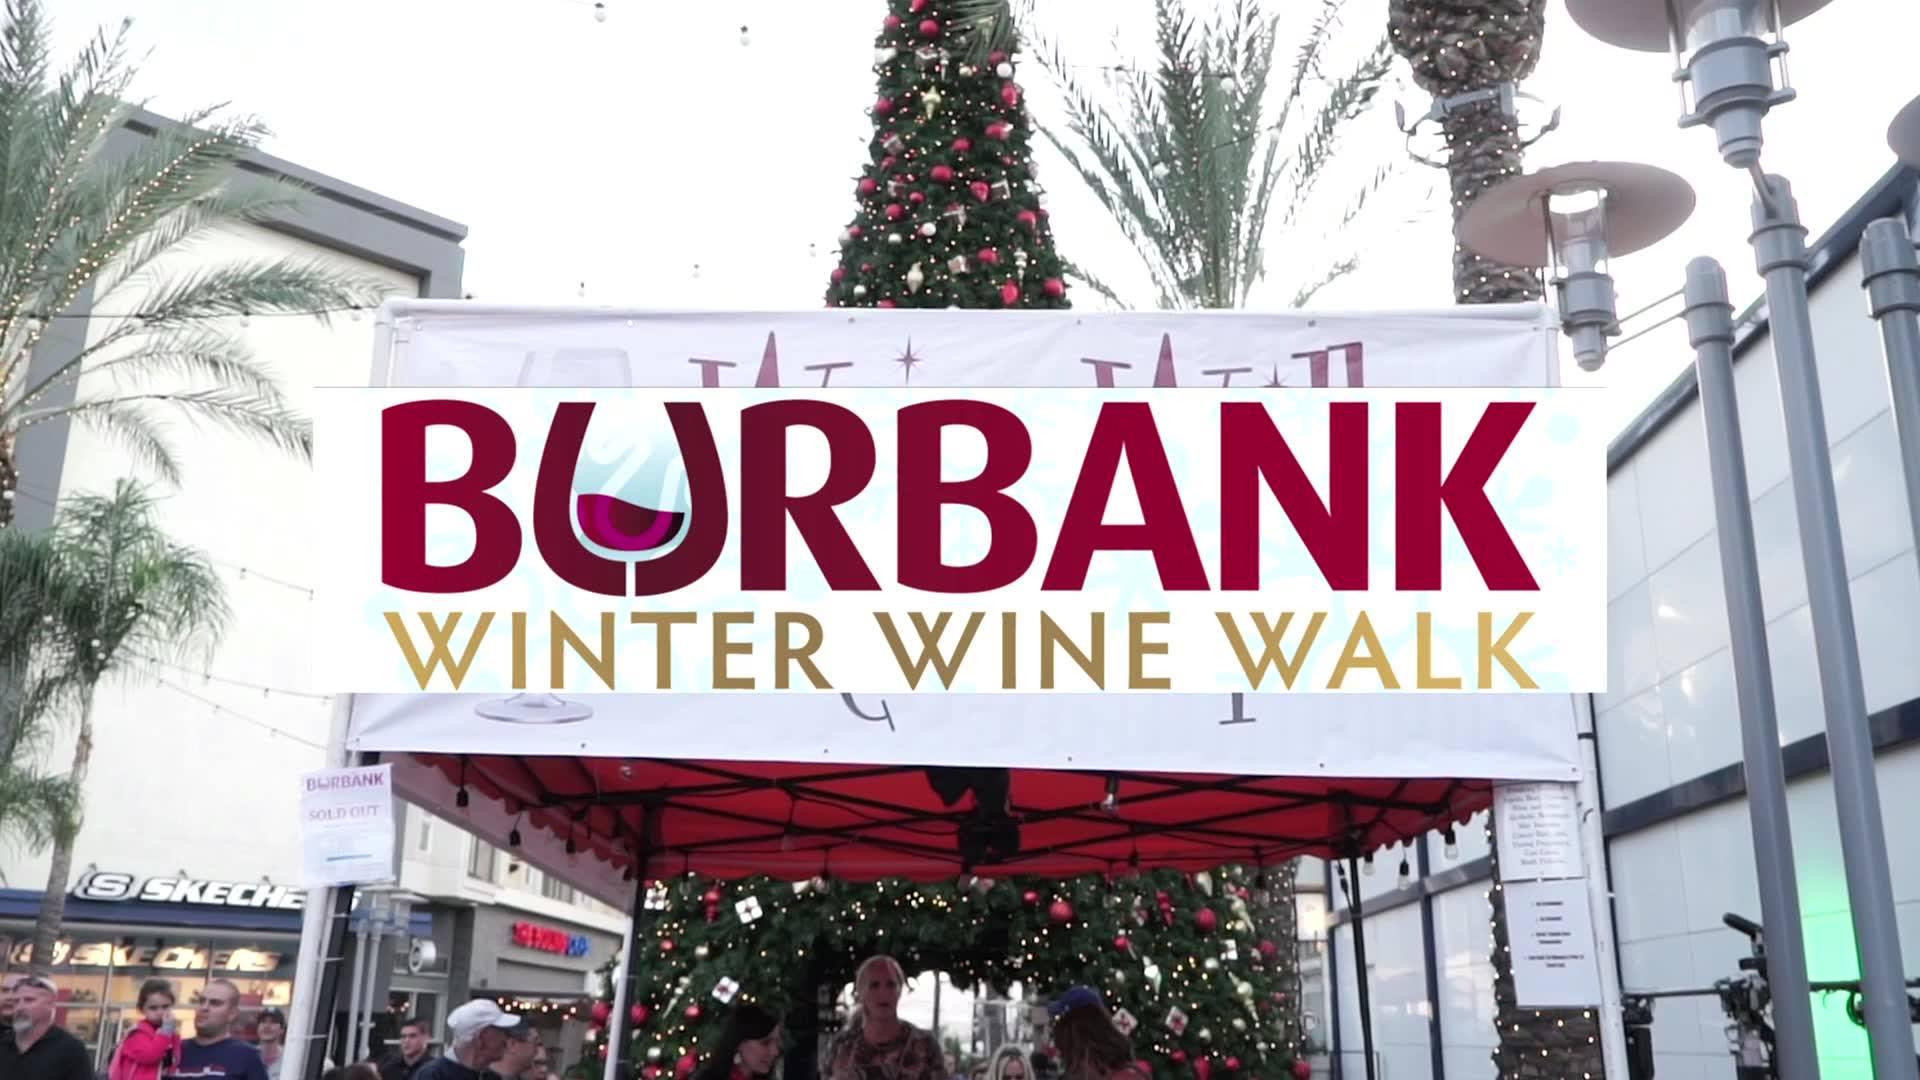 Burbank Winter Wine Walk